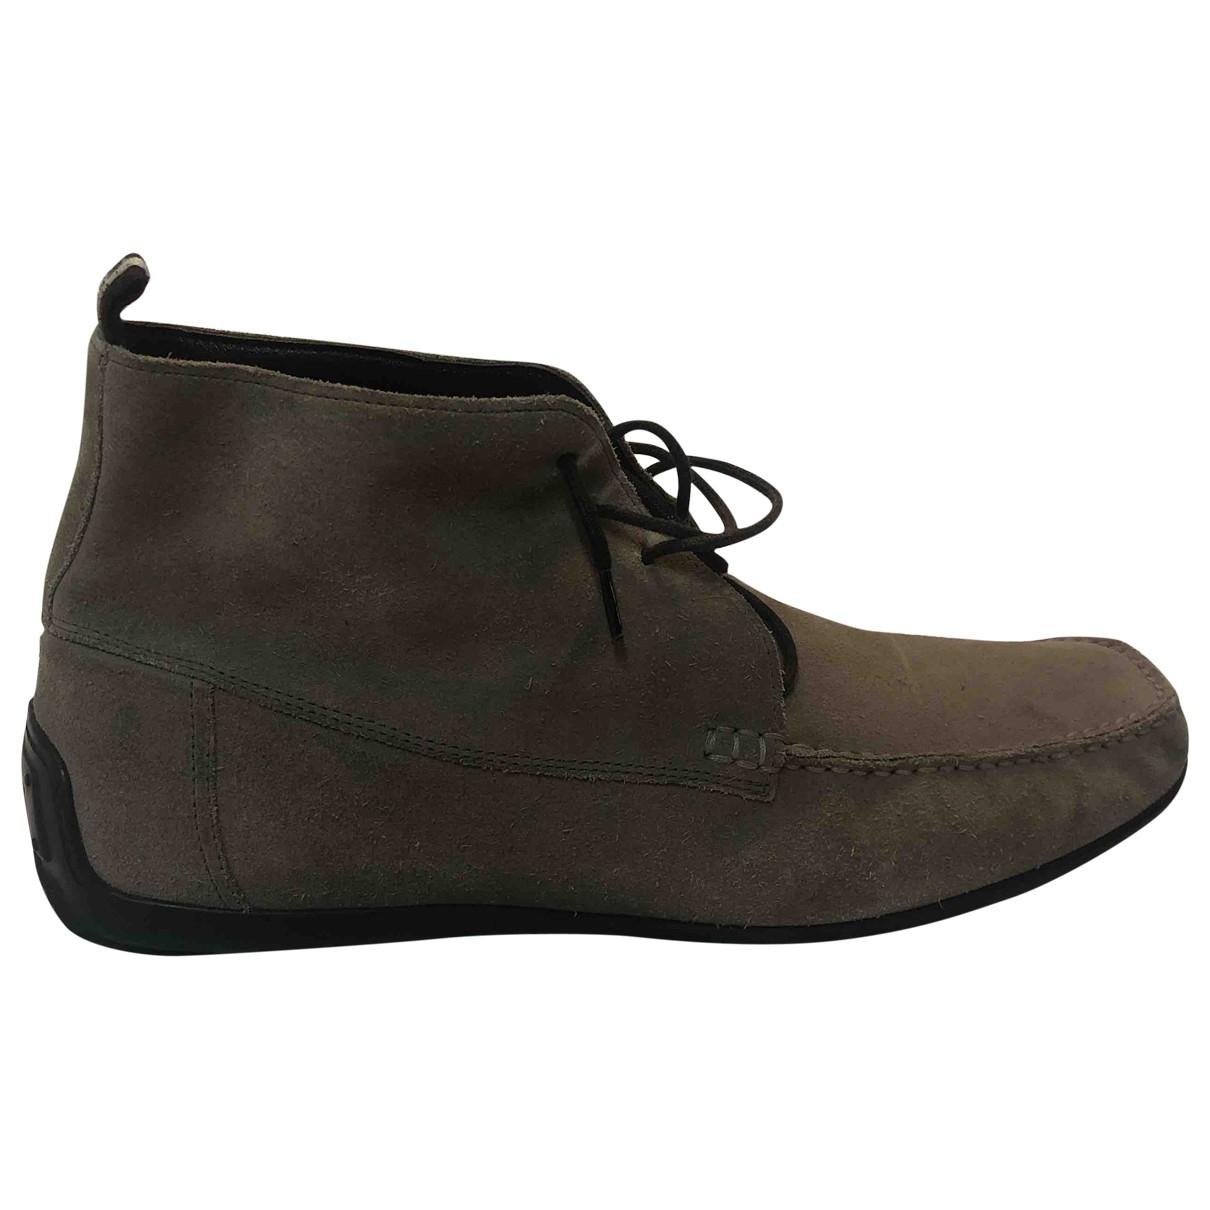 Bally \N Stiefel in  Khaki Veloursleder